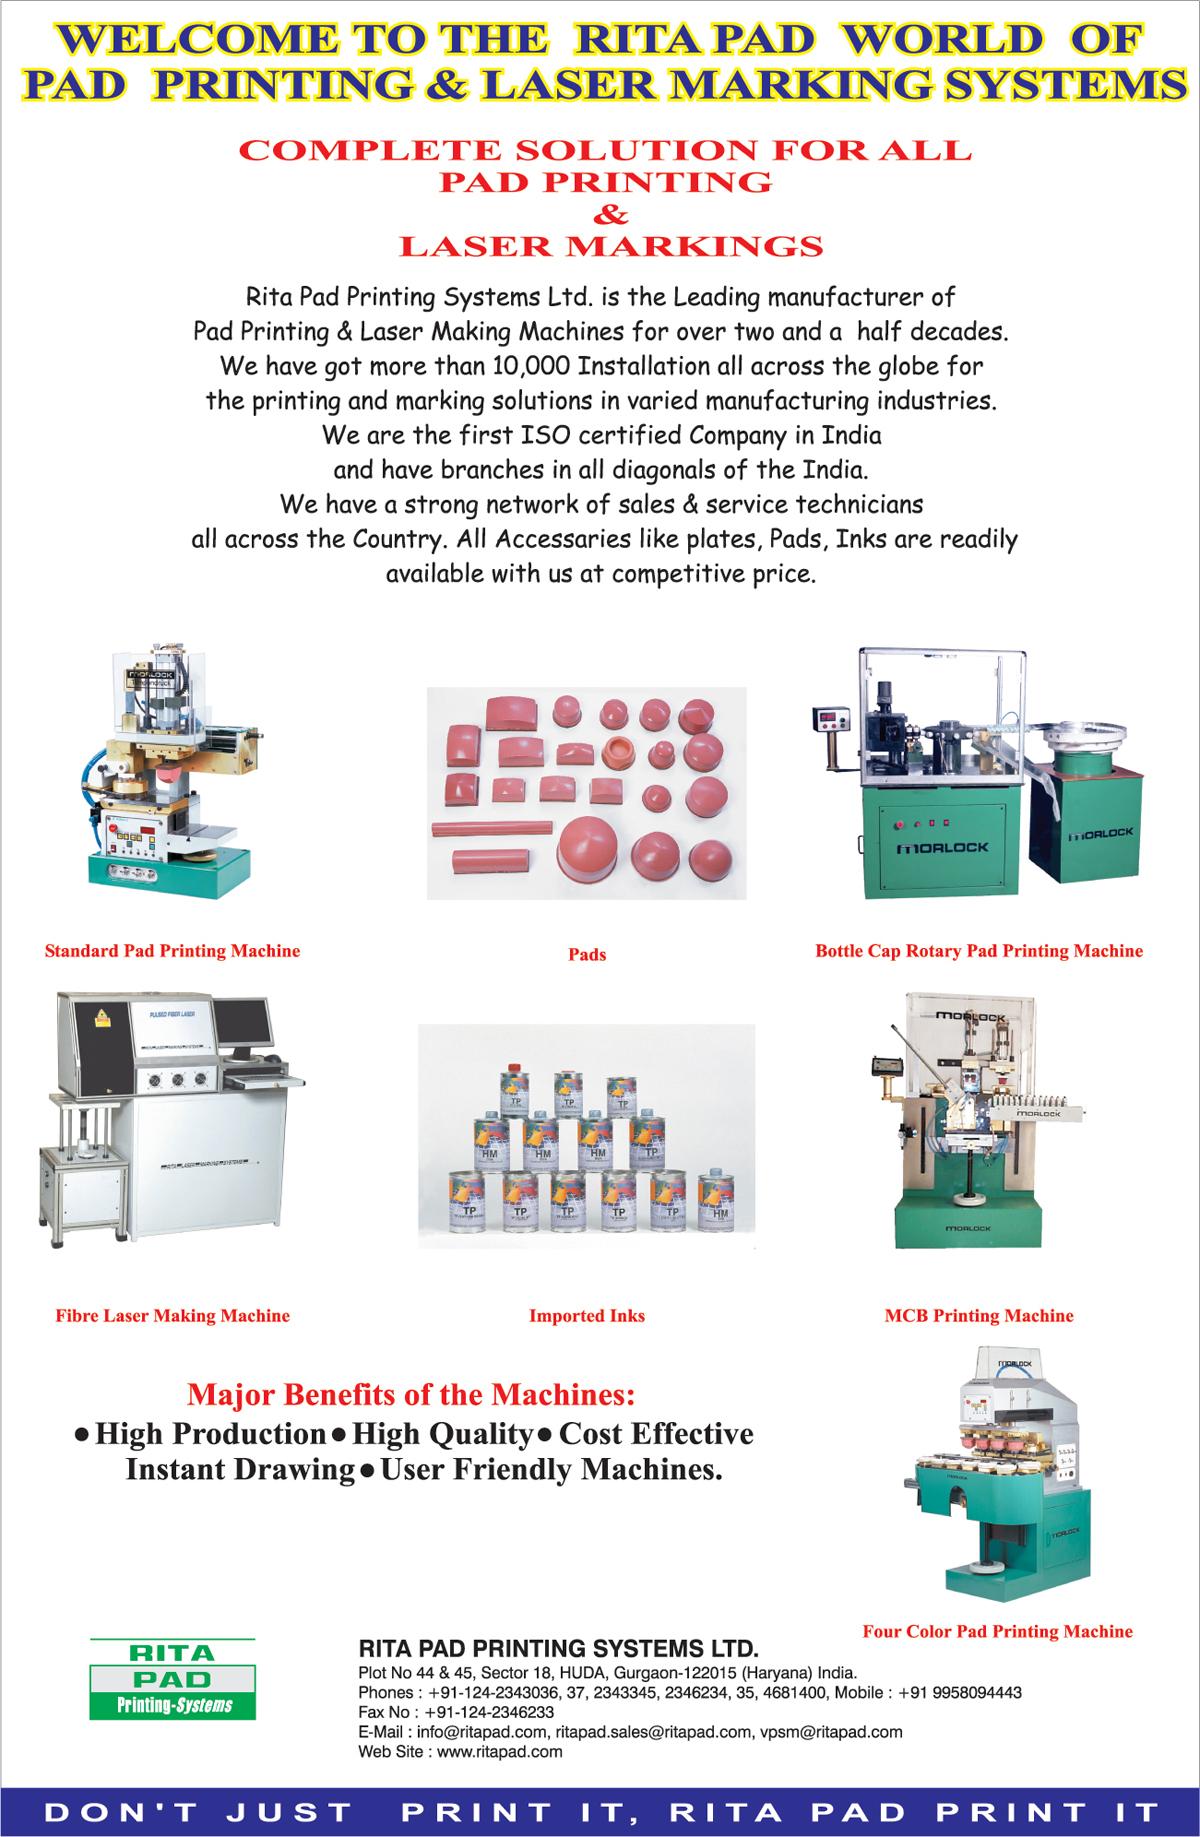 Pad Printing Machines, Printing Pads, Bottle Cap Rotary Pad Printing Machines, Fibre Laser Making Machines, Imported Inks, MCB Printing Machines, Four Color Pad Printing Machines, Imported Pad Printing Inks,Pads